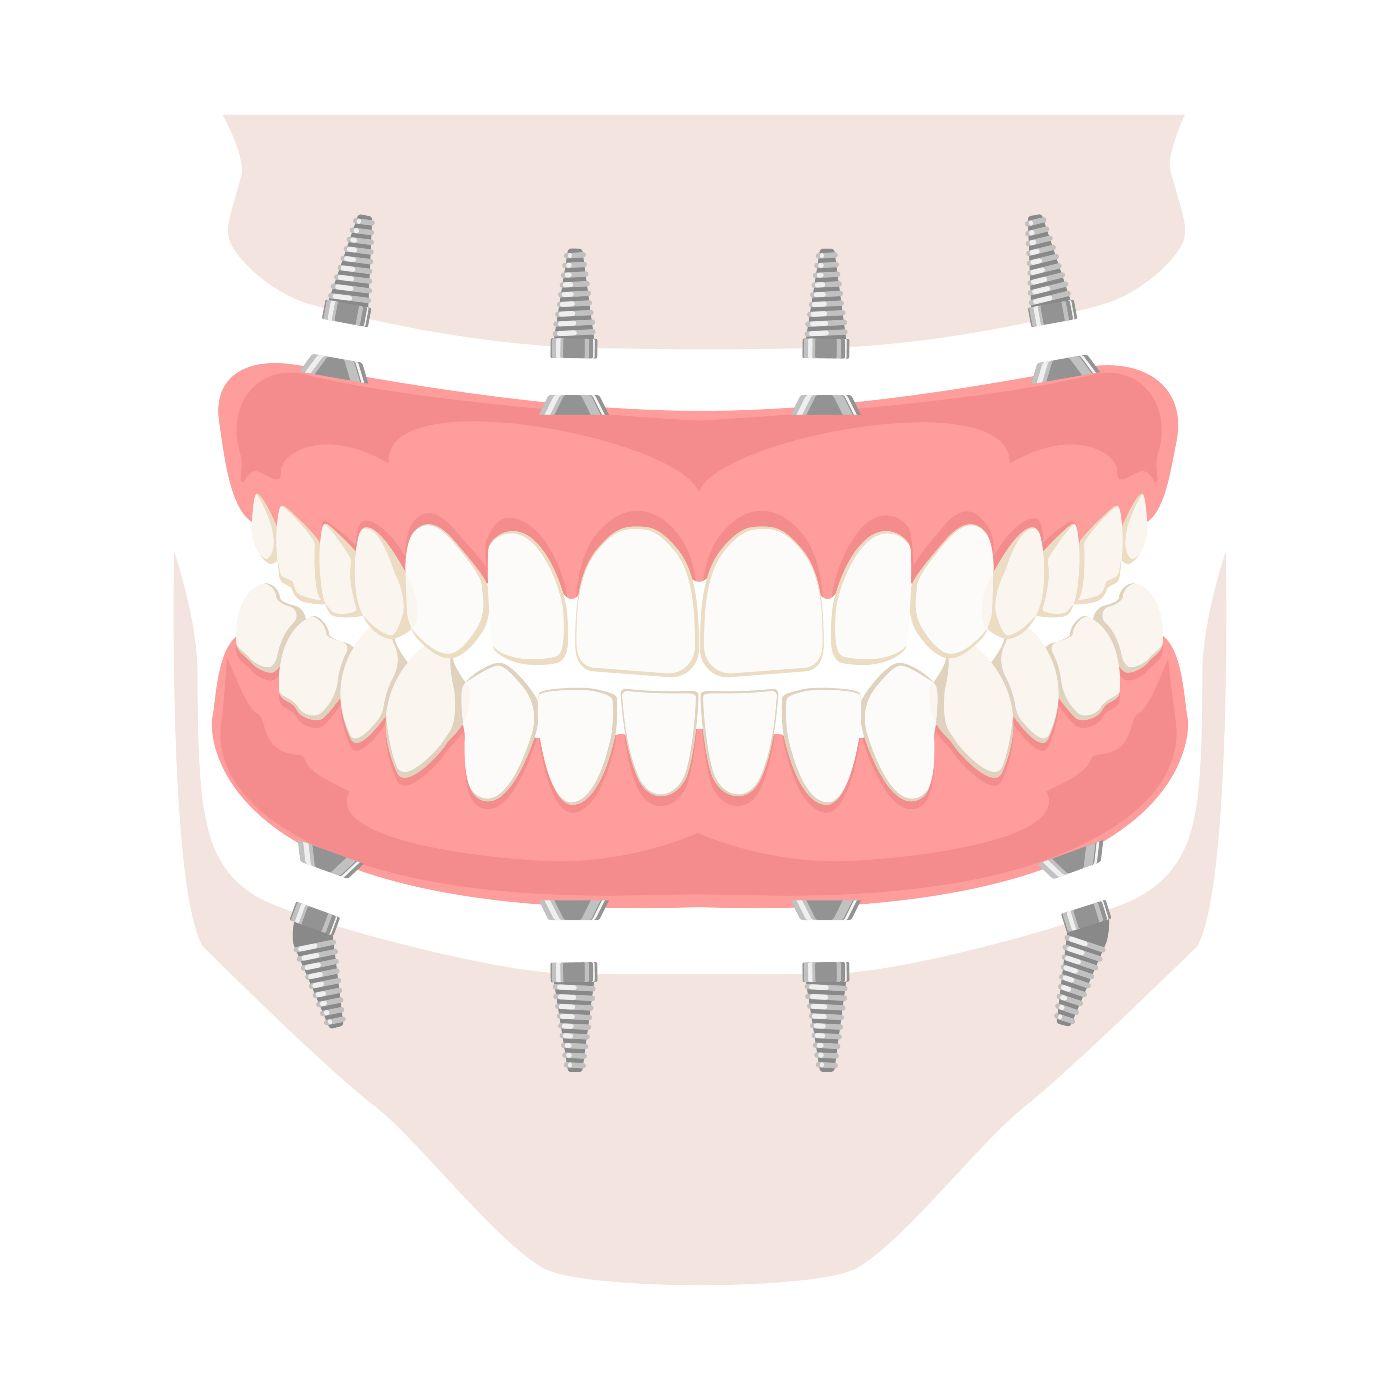 Spartanburg dental implants